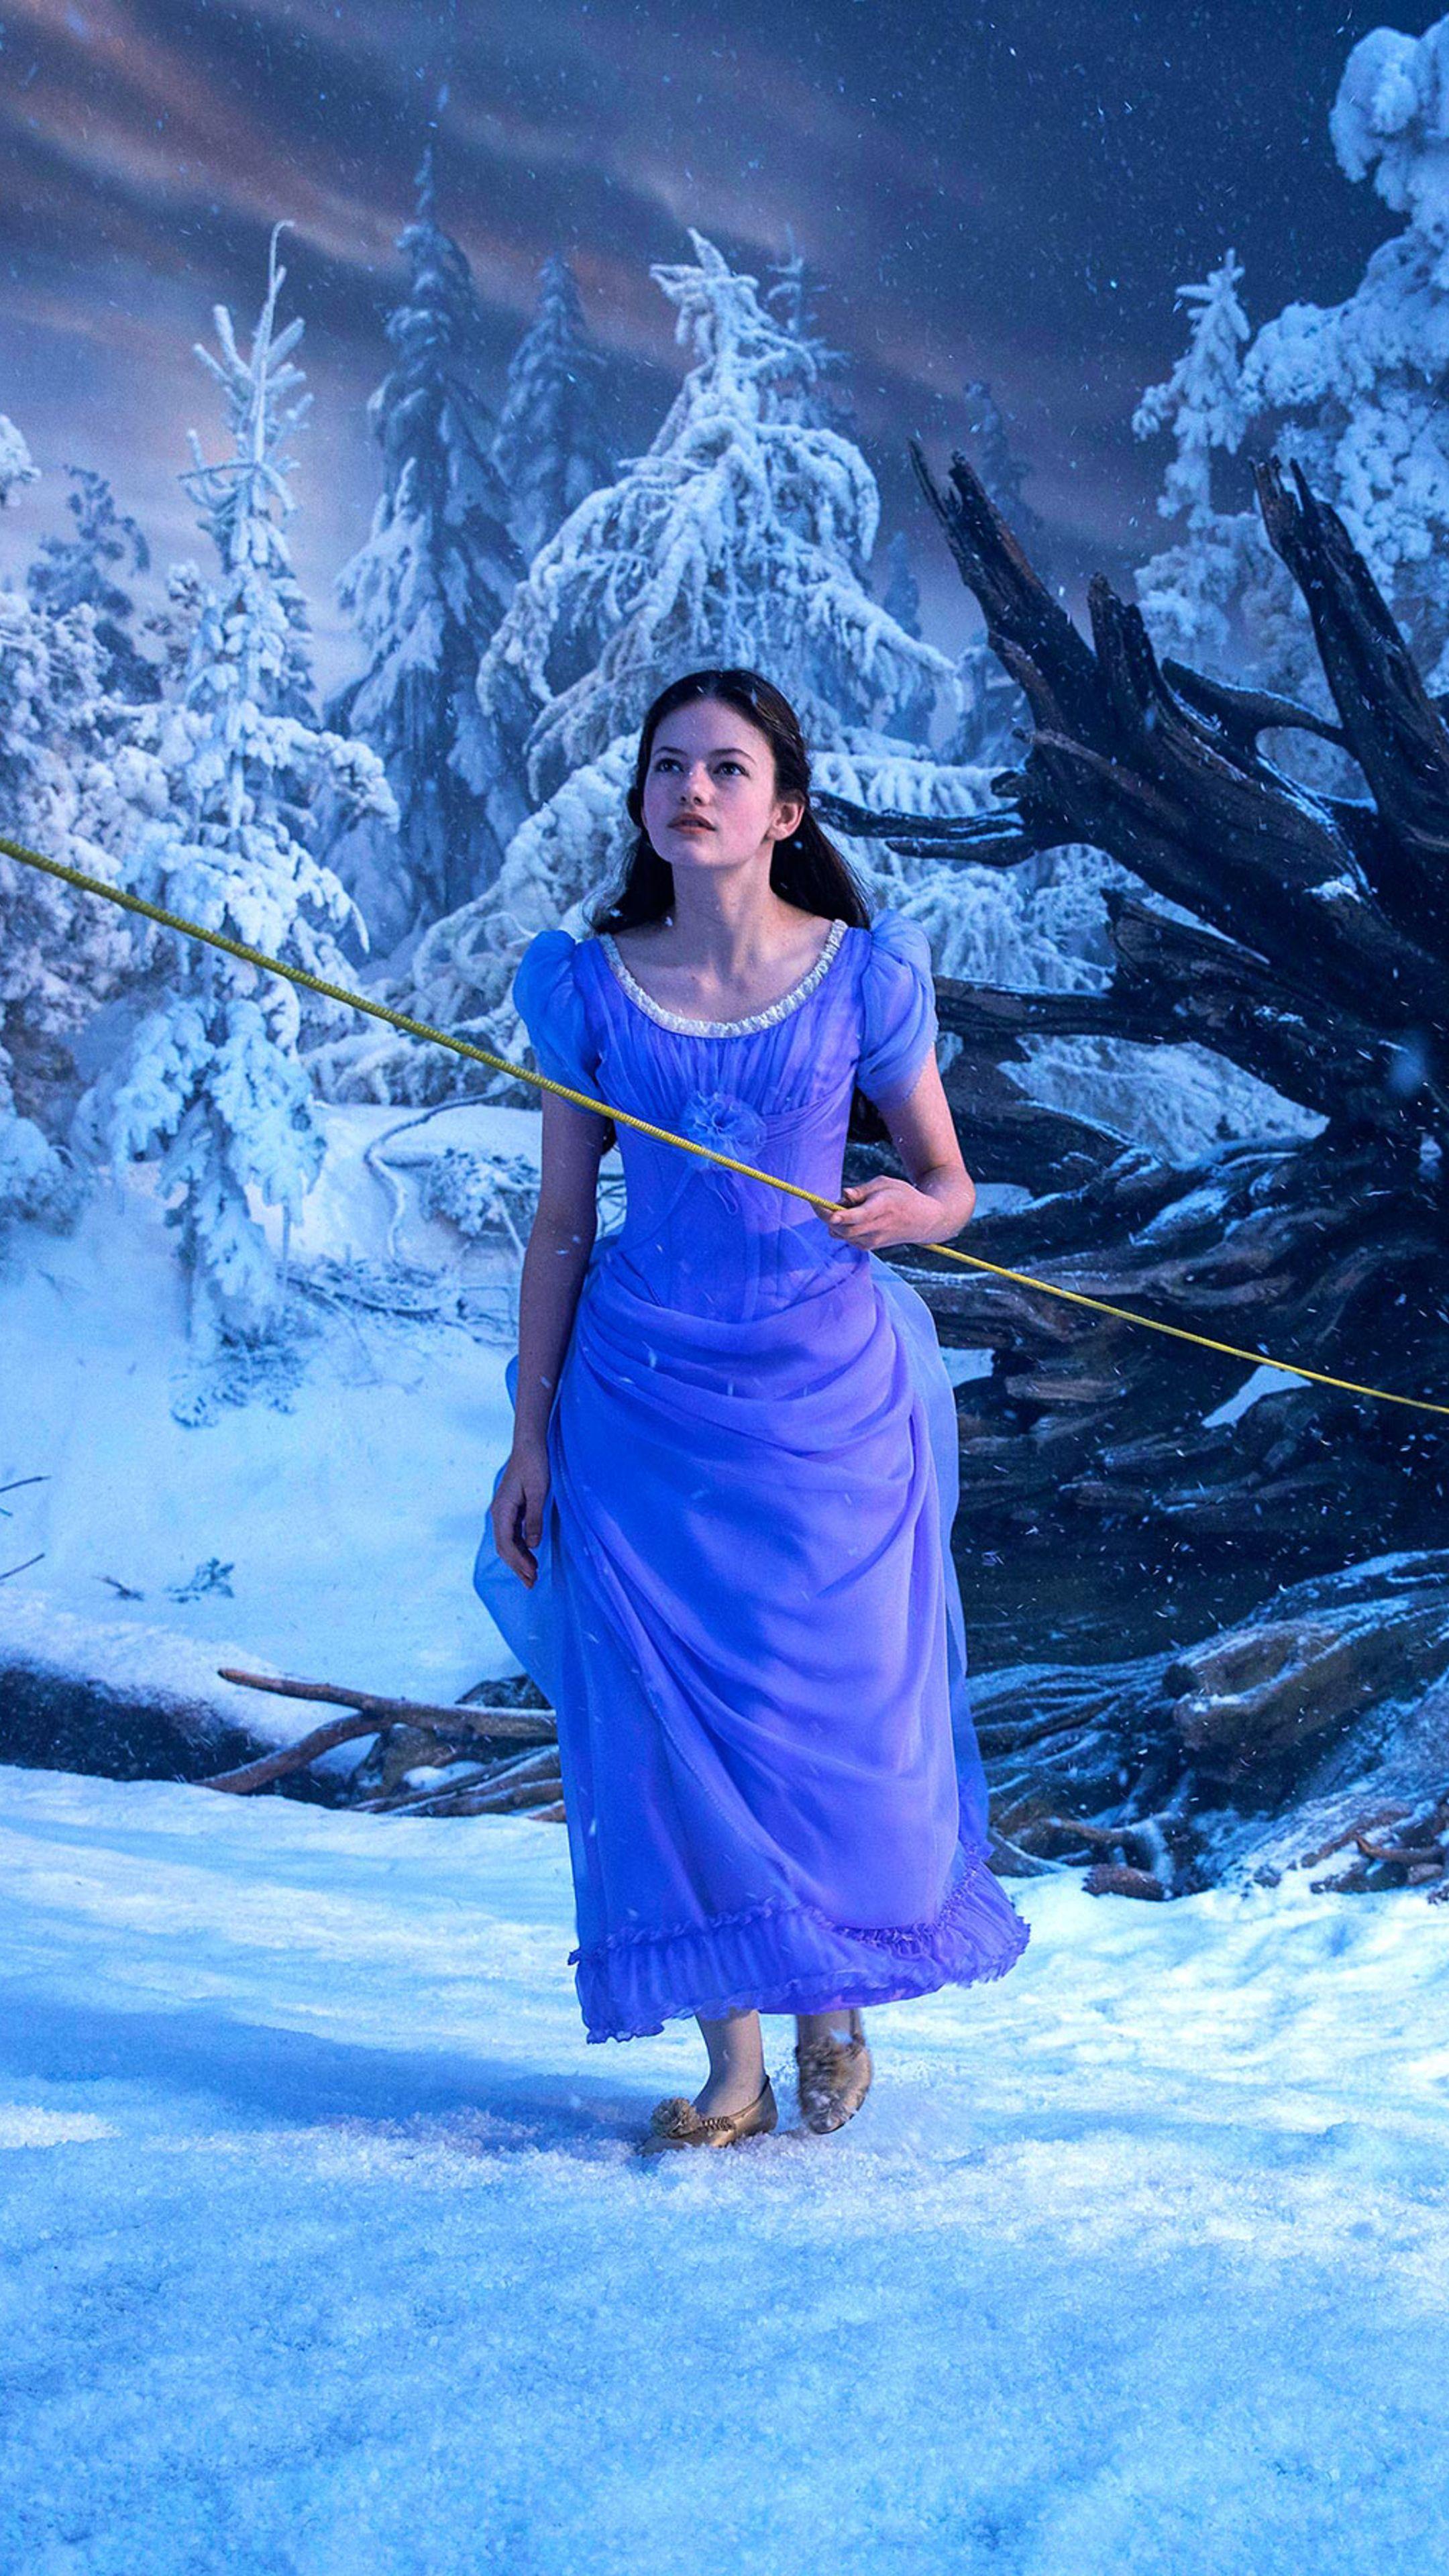 Mackenzie Foy as Clara in The Nutcracker and the Four Realms (2018) (2160 x  3840) d03ea2c6d740